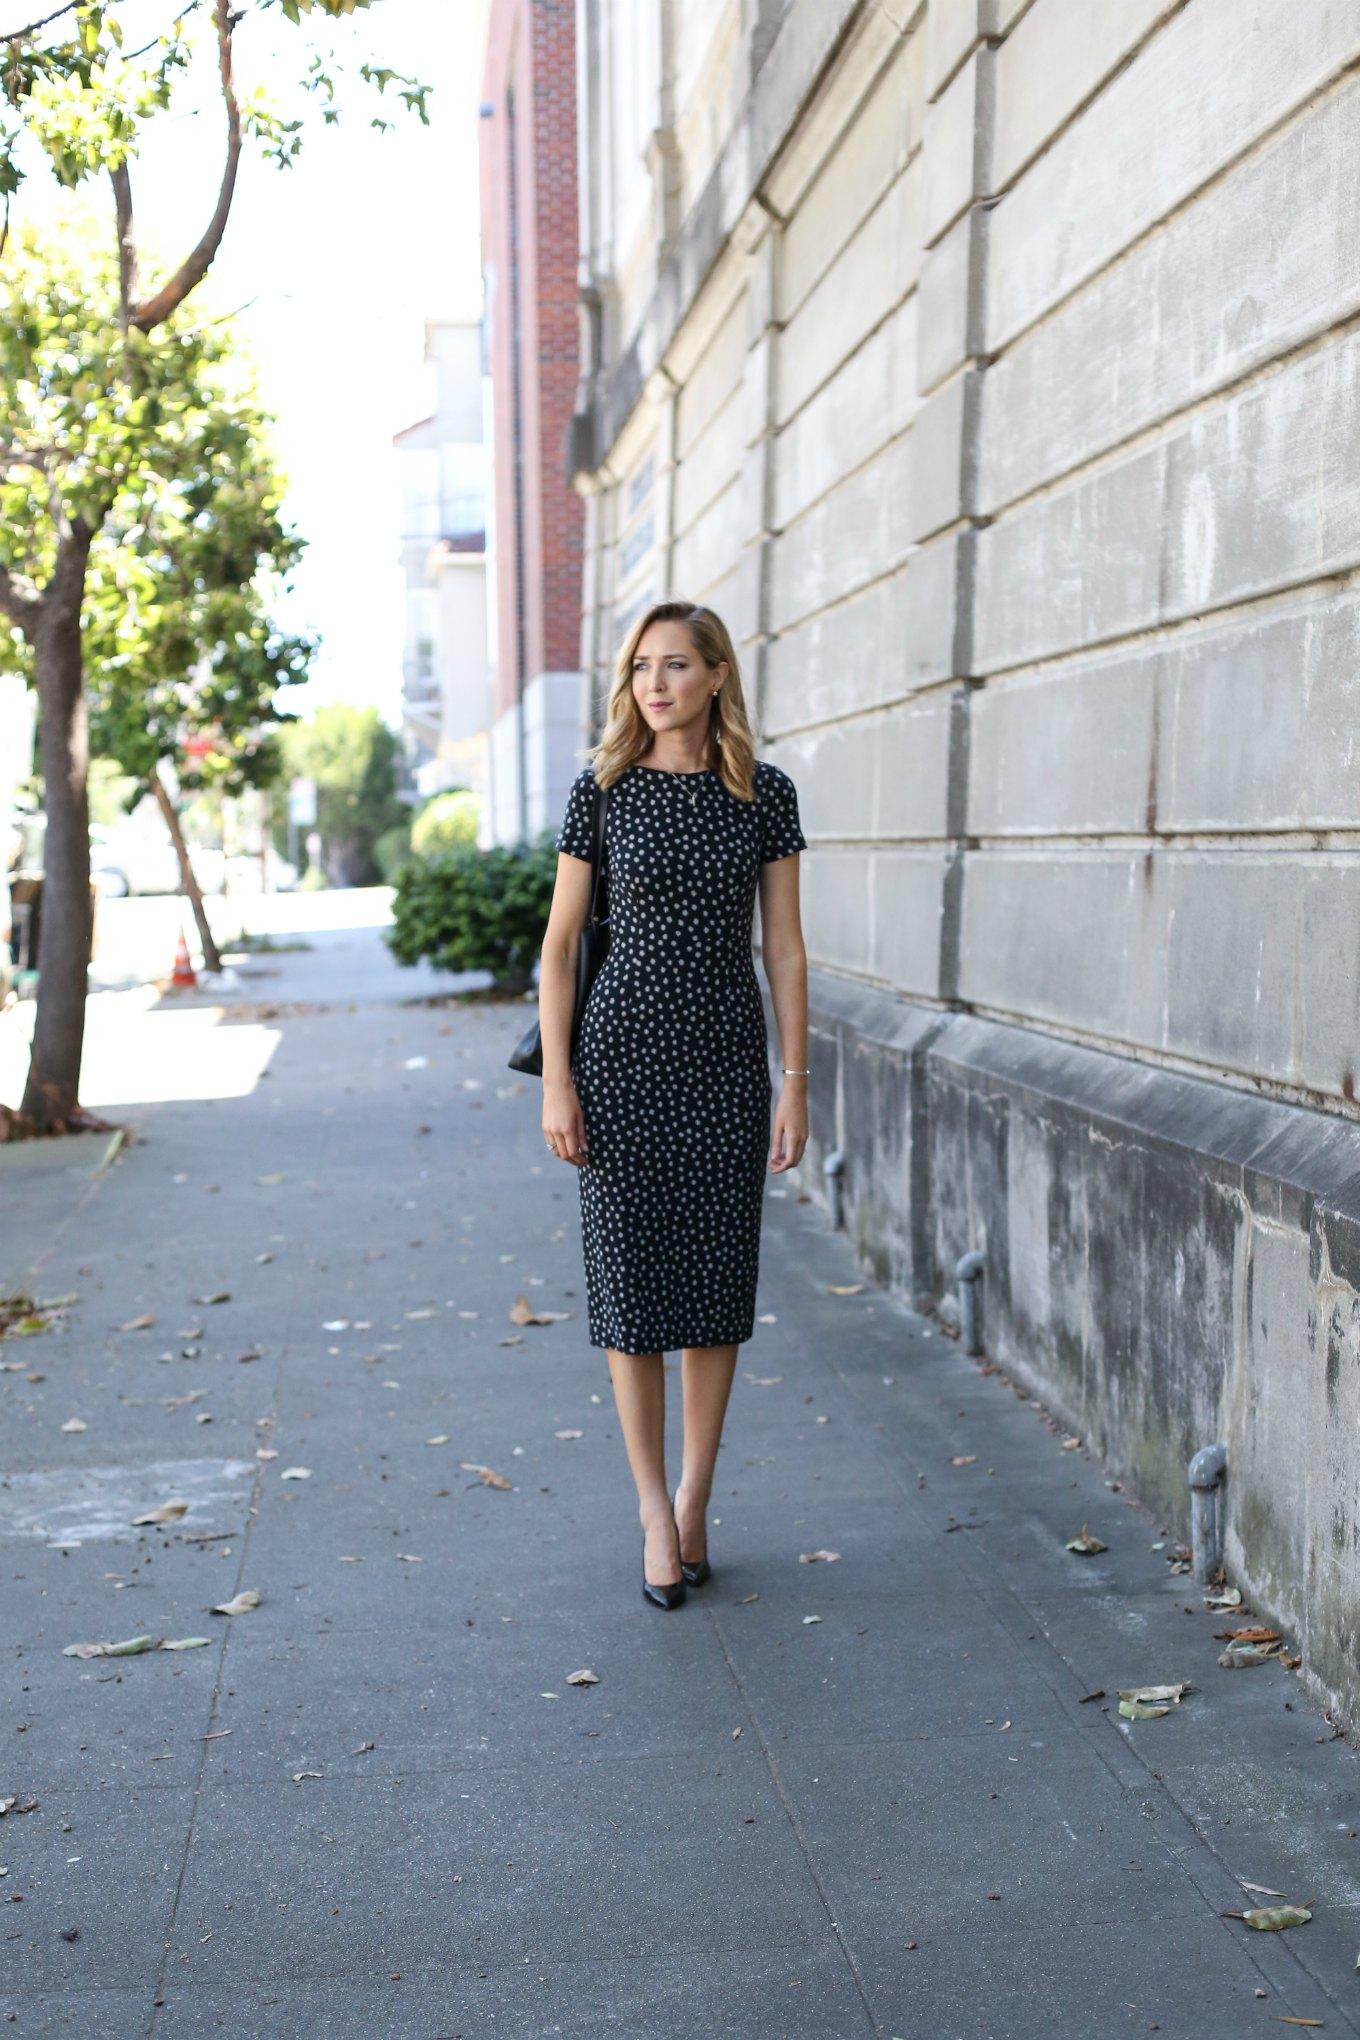 anthropologie-black-short-sleeve-sheath-dress-polka-dot-classic-work-wear-office-business-professional-women-style-fashion-blog-s - Günün tarzı Benekli elbise